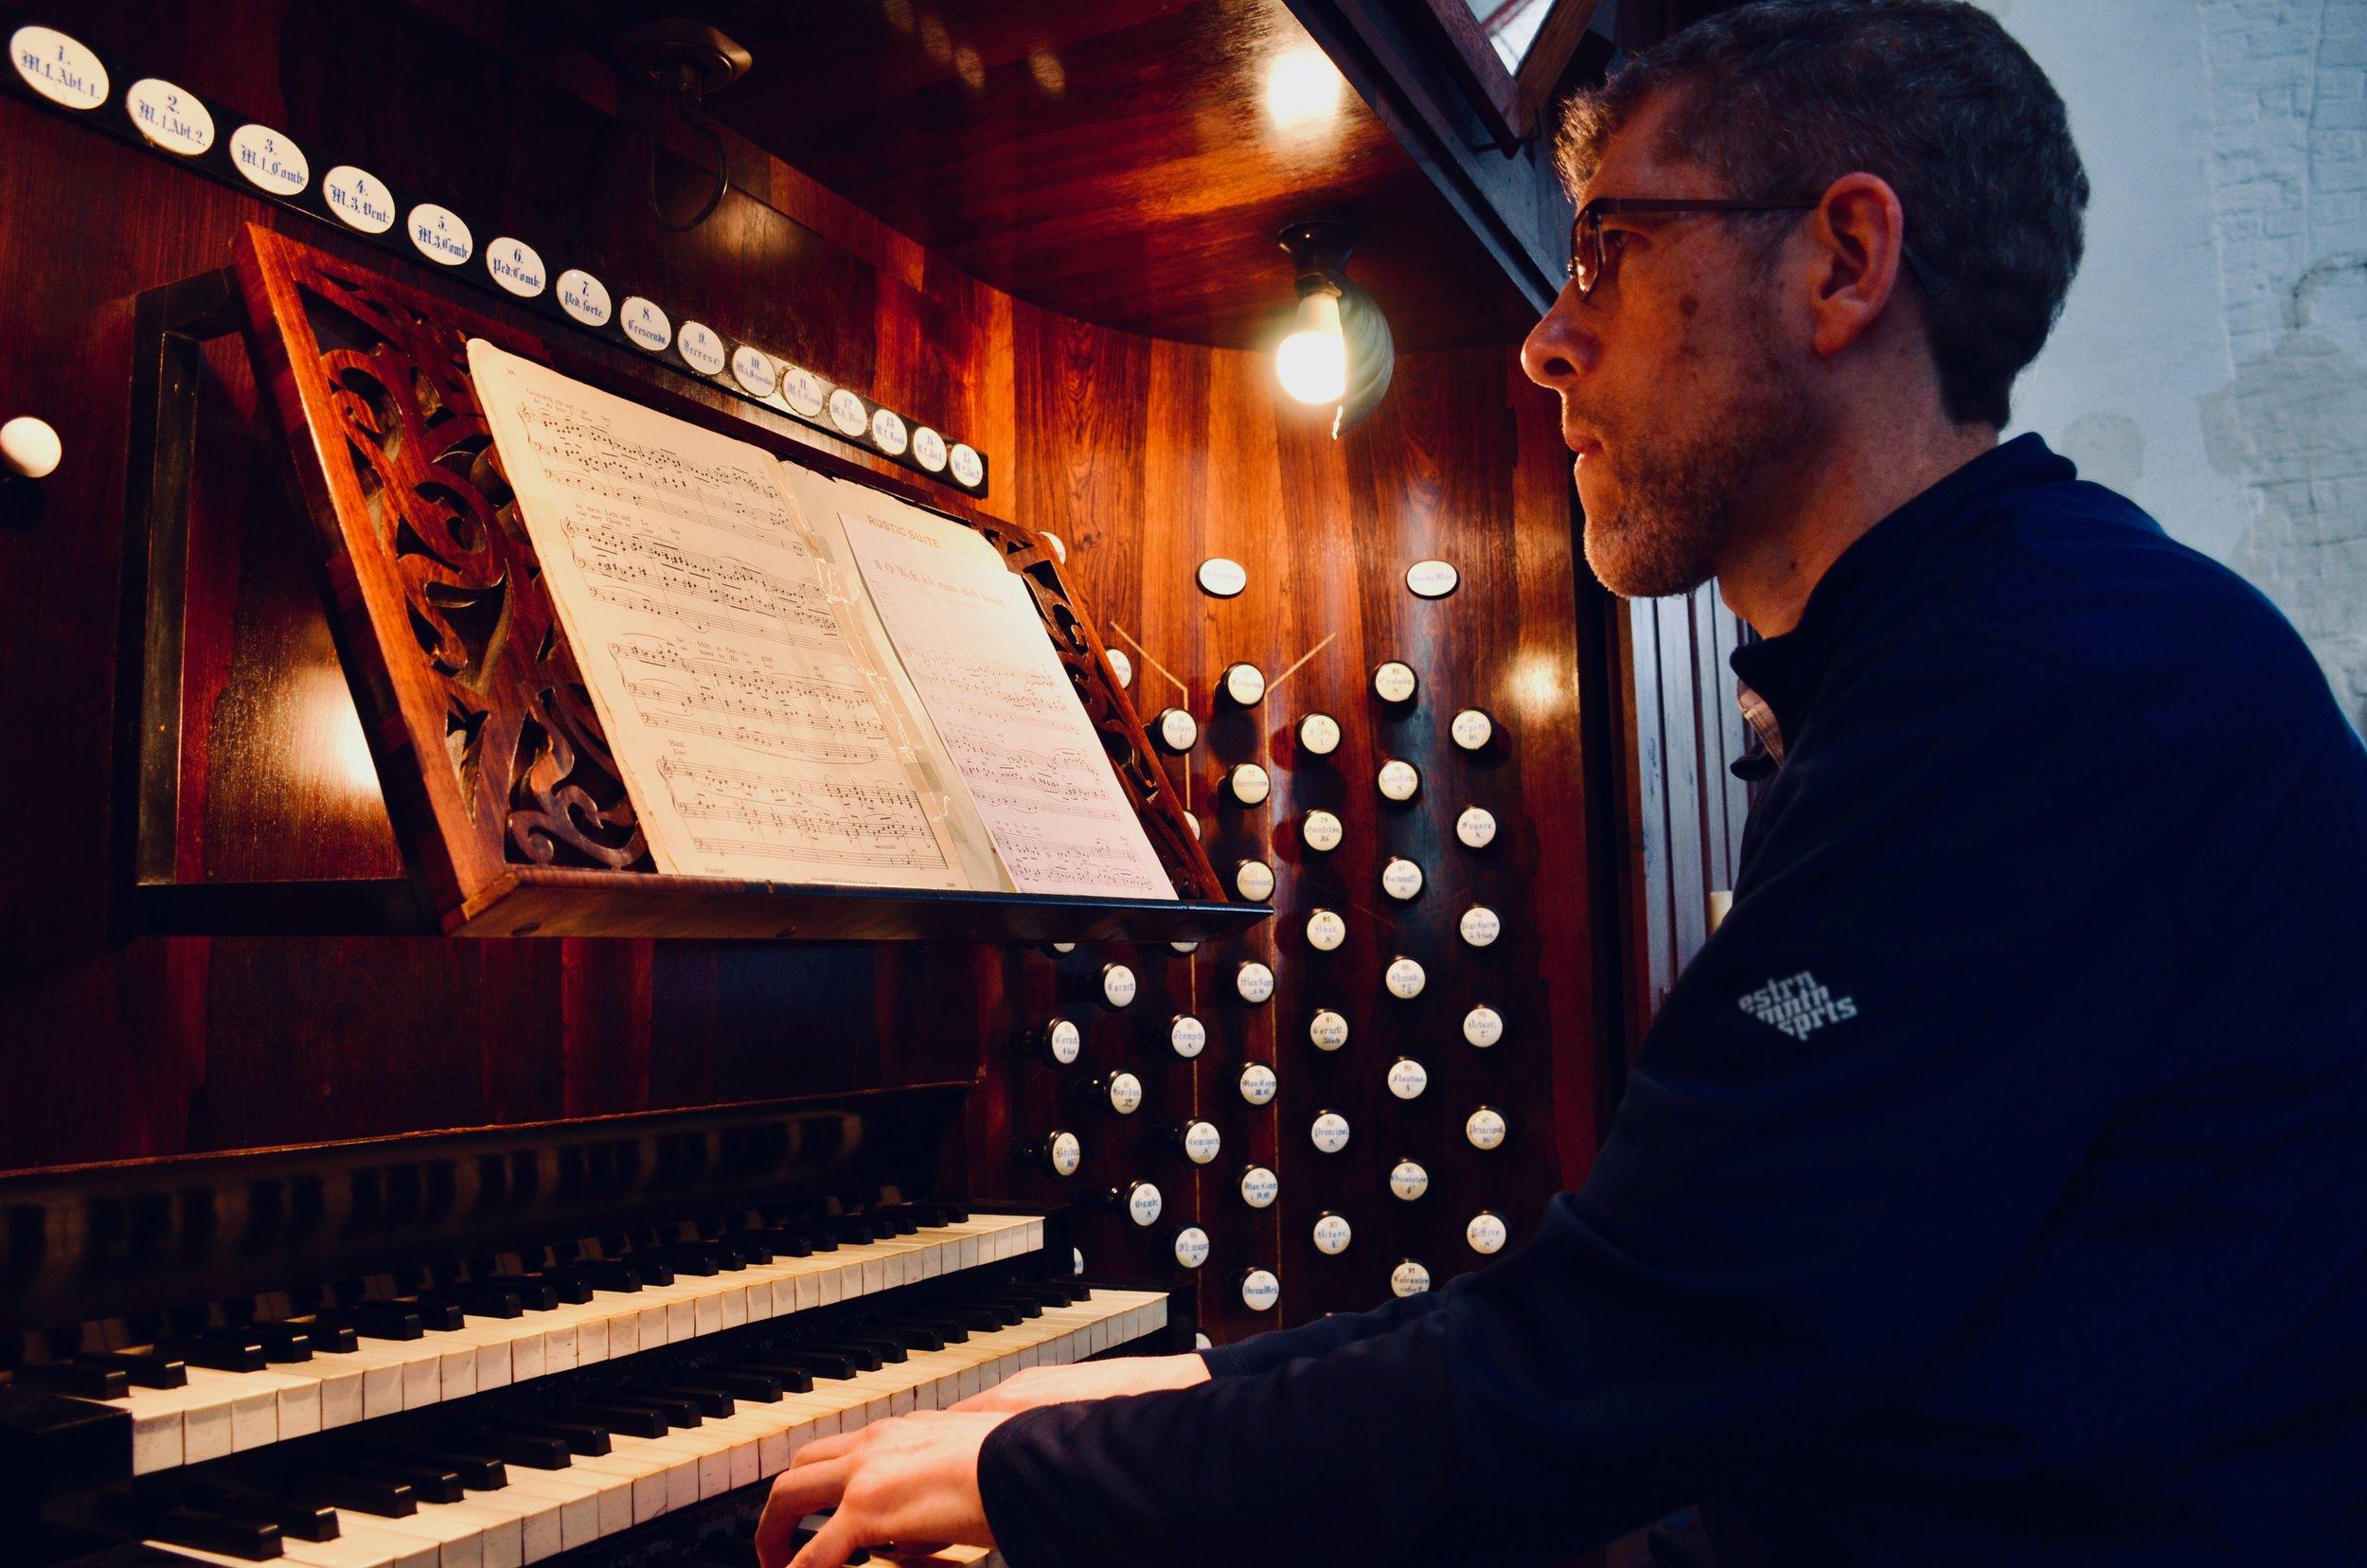 Chris Porter plays 1871 Ladegast Organ, Schwerin Dom. Boston Organ Studio.